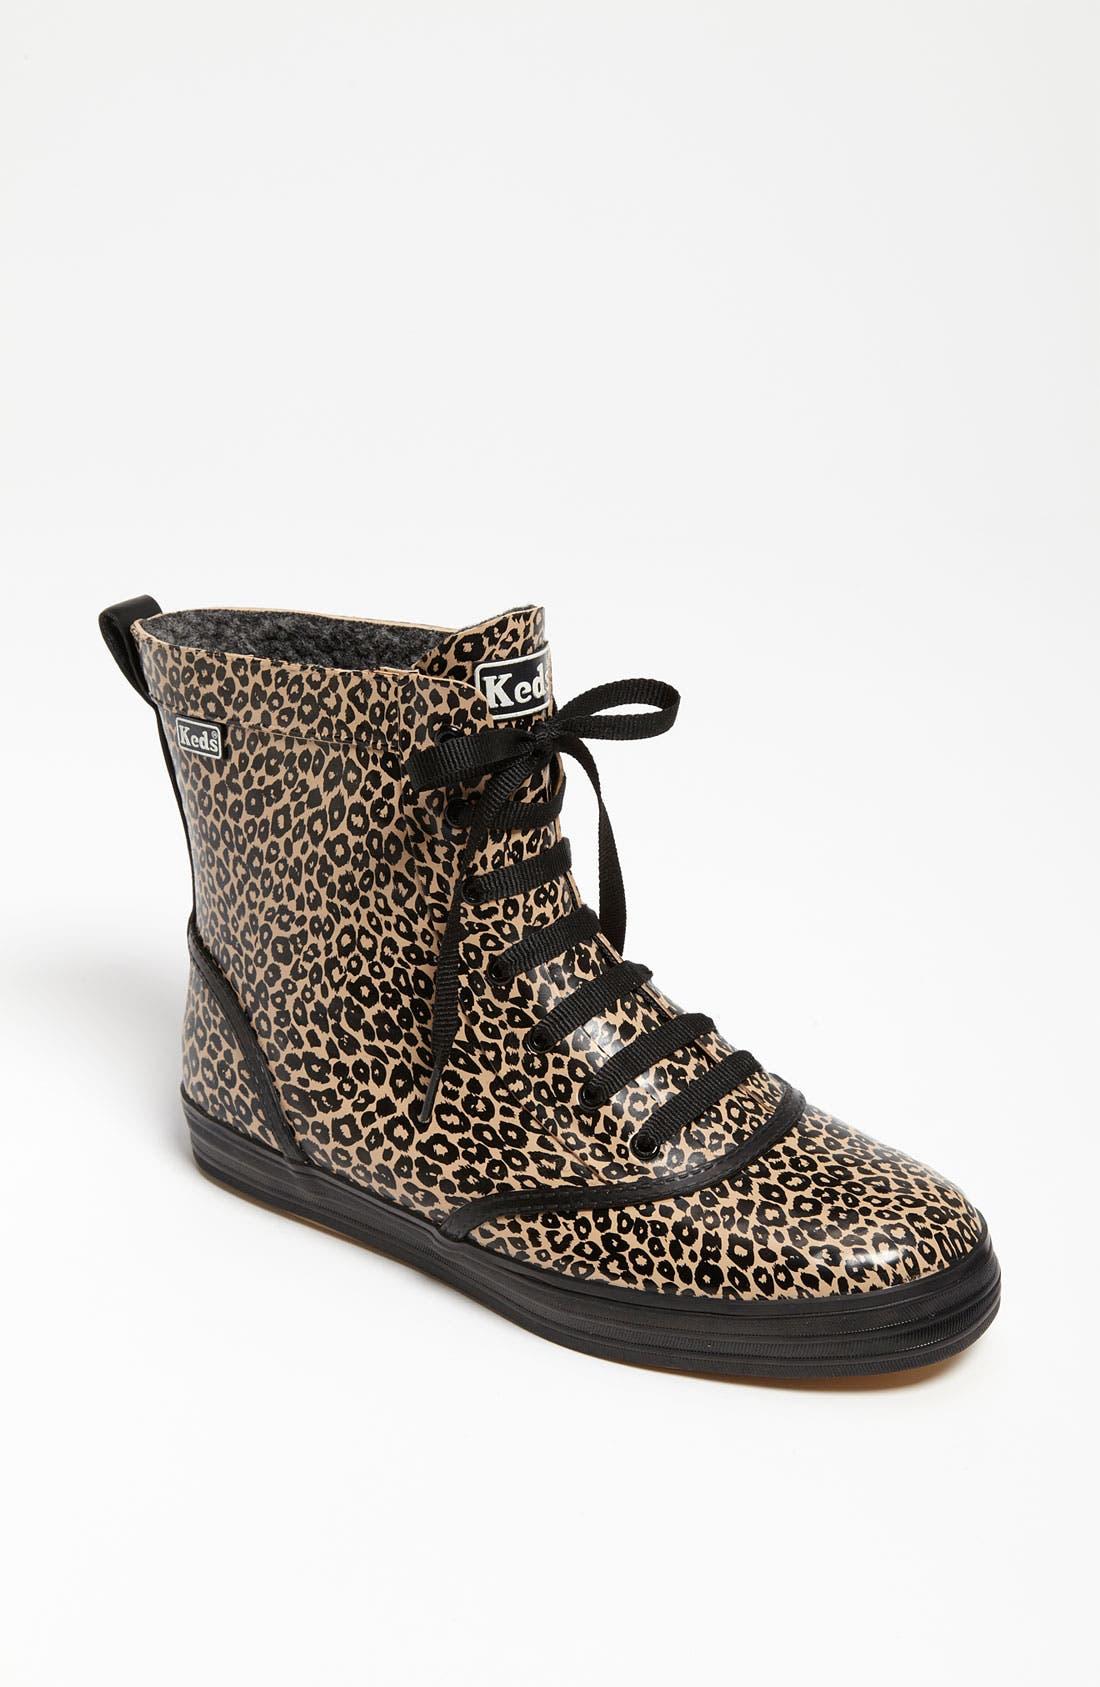 Alternate Image 1 Selected - Keds® 'Champion Puddle Jumper' Boot